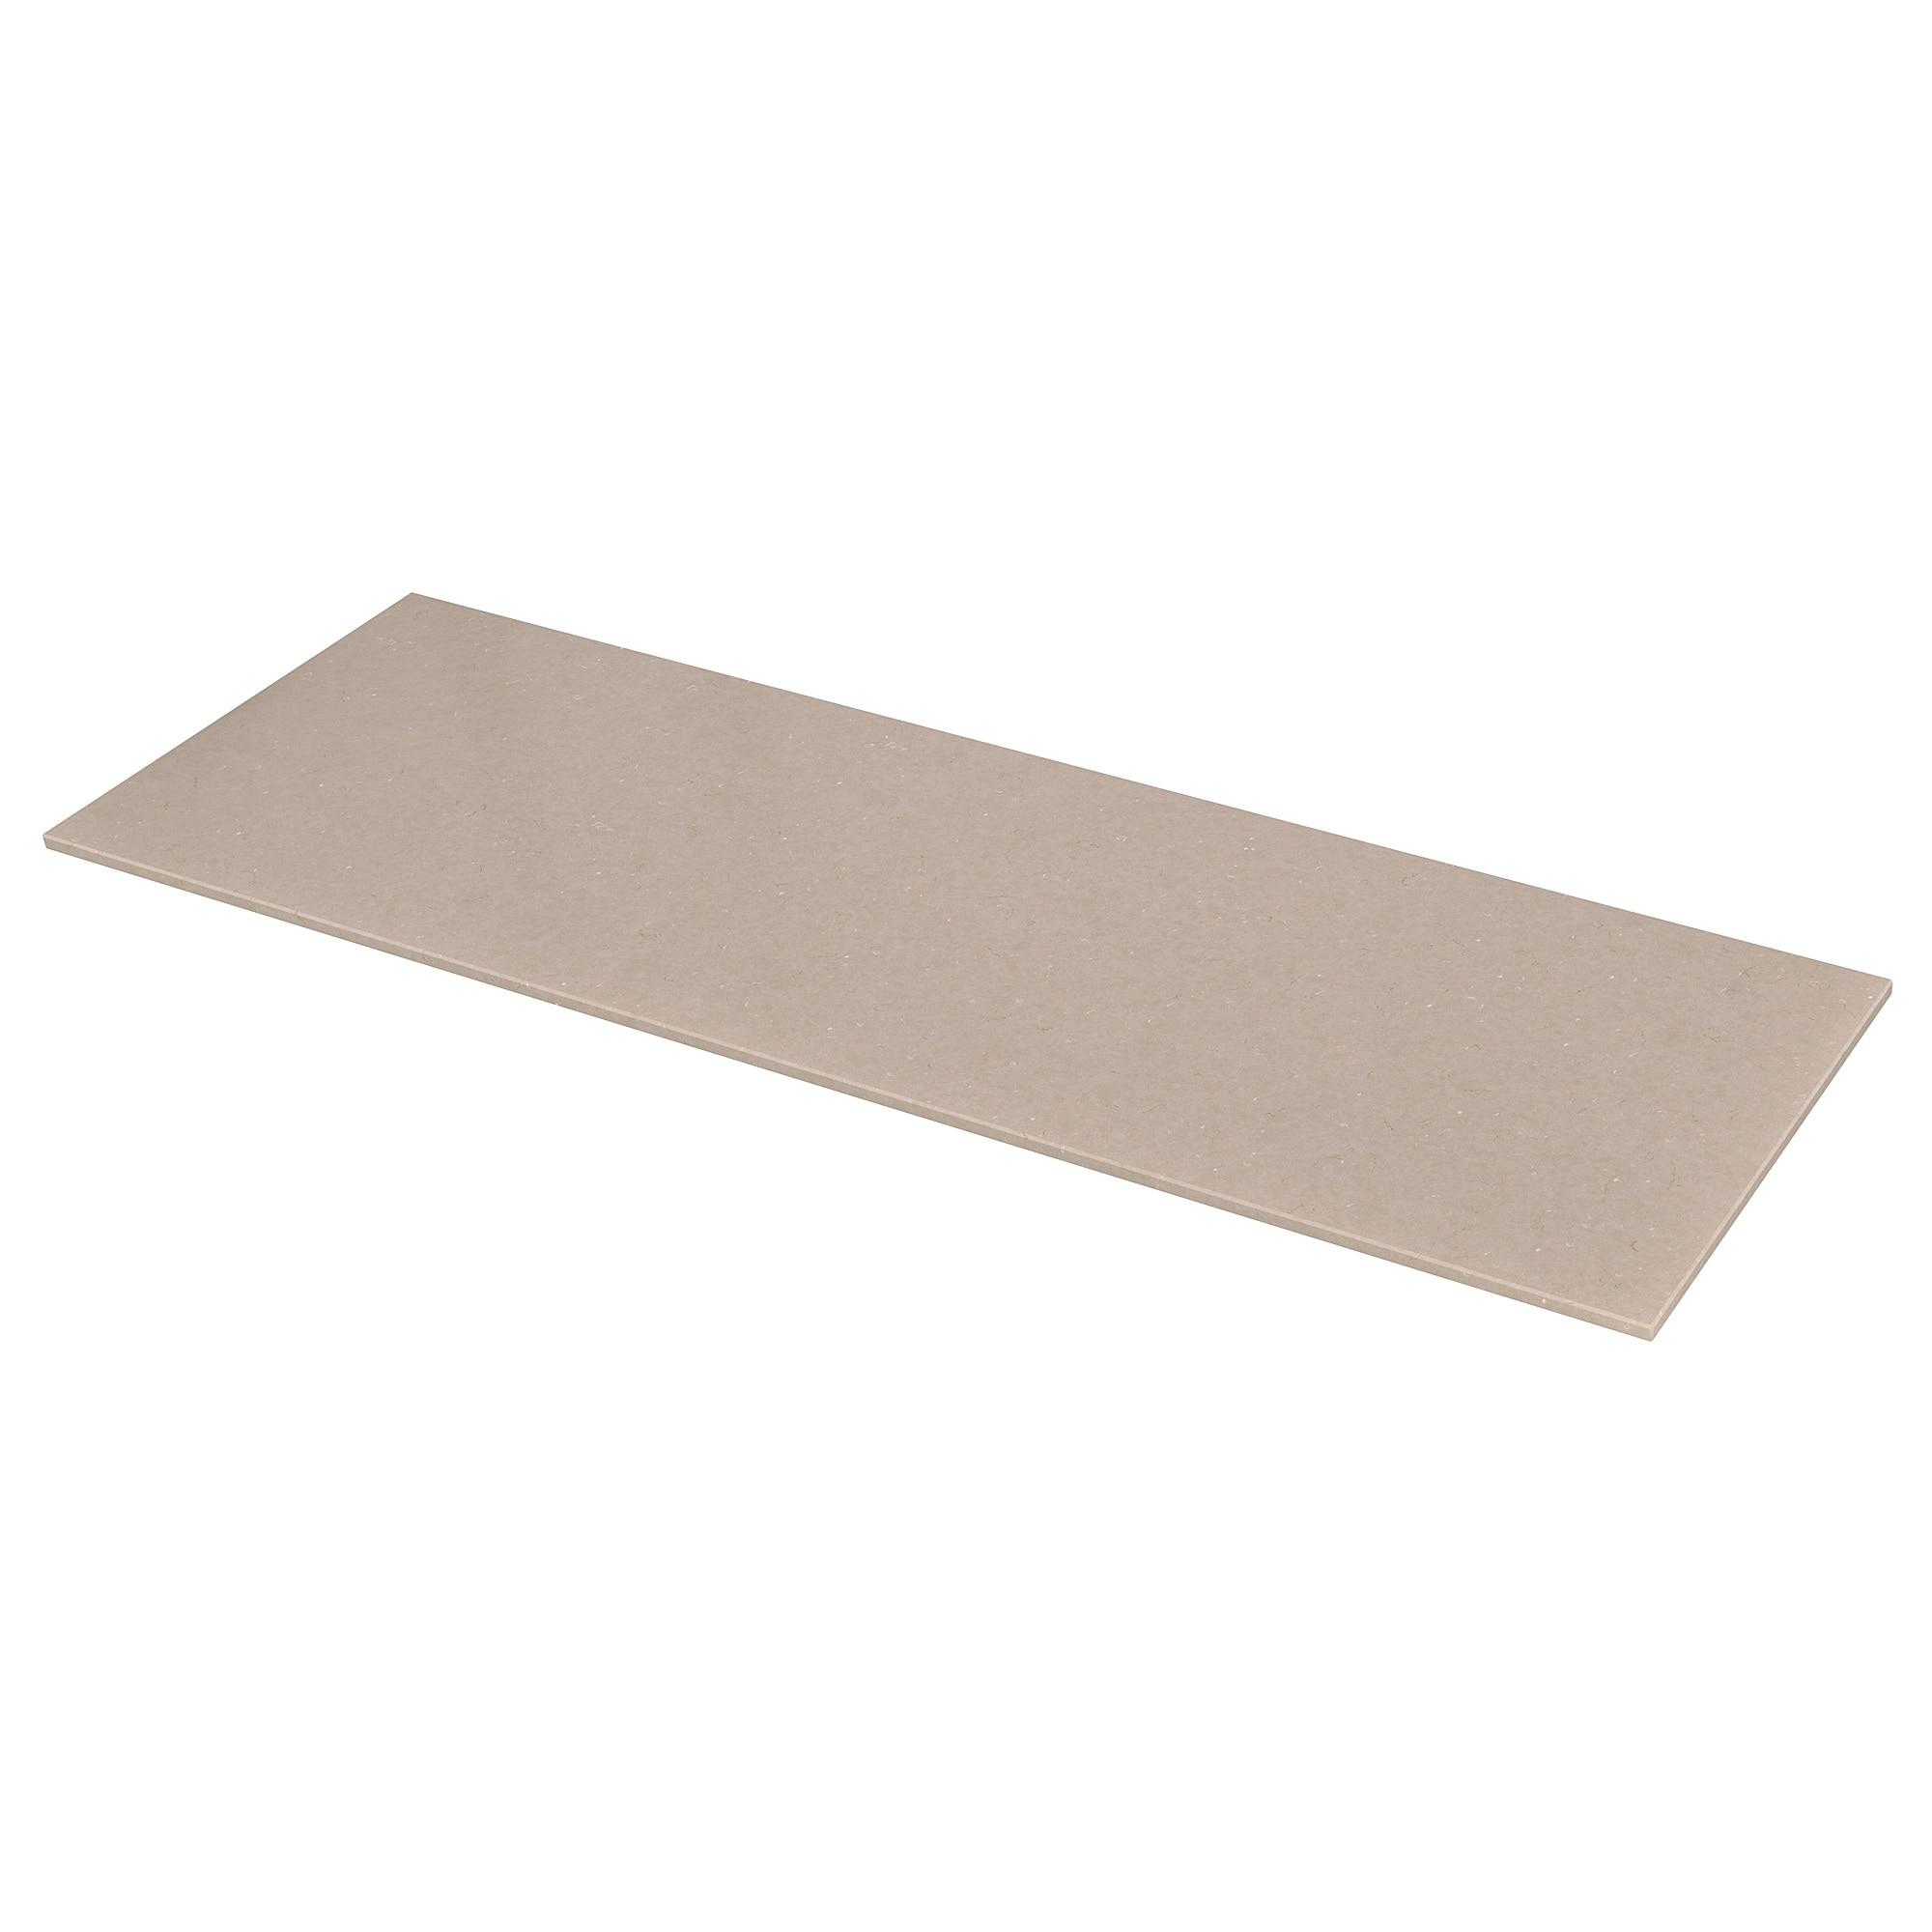 Столешница под заказ КАСКЕР артикуль № 004.308.54 в наличии. Онлайн каталог IKEA РБ. Быстрая доставка и монтаж.